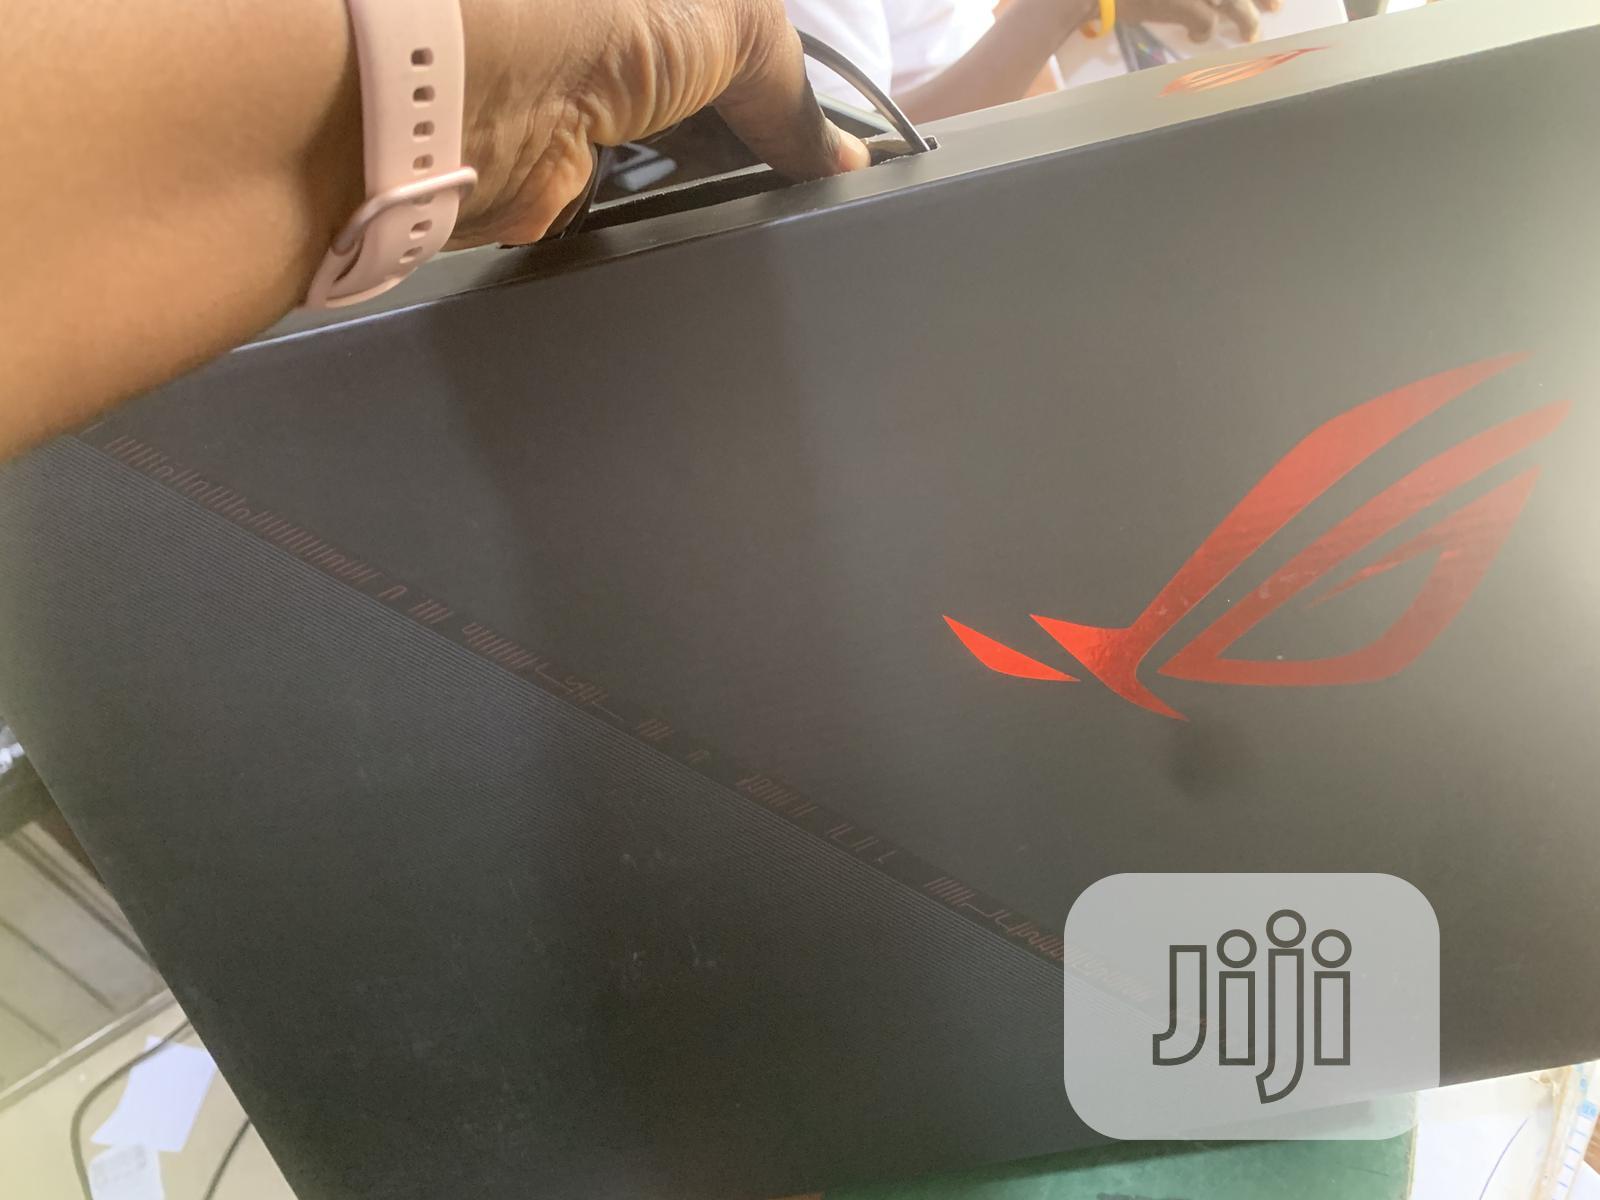 New Laptop Asus ROG Zephyrus M15 GU502LU 16GB Intel Core i7 SSD 1T